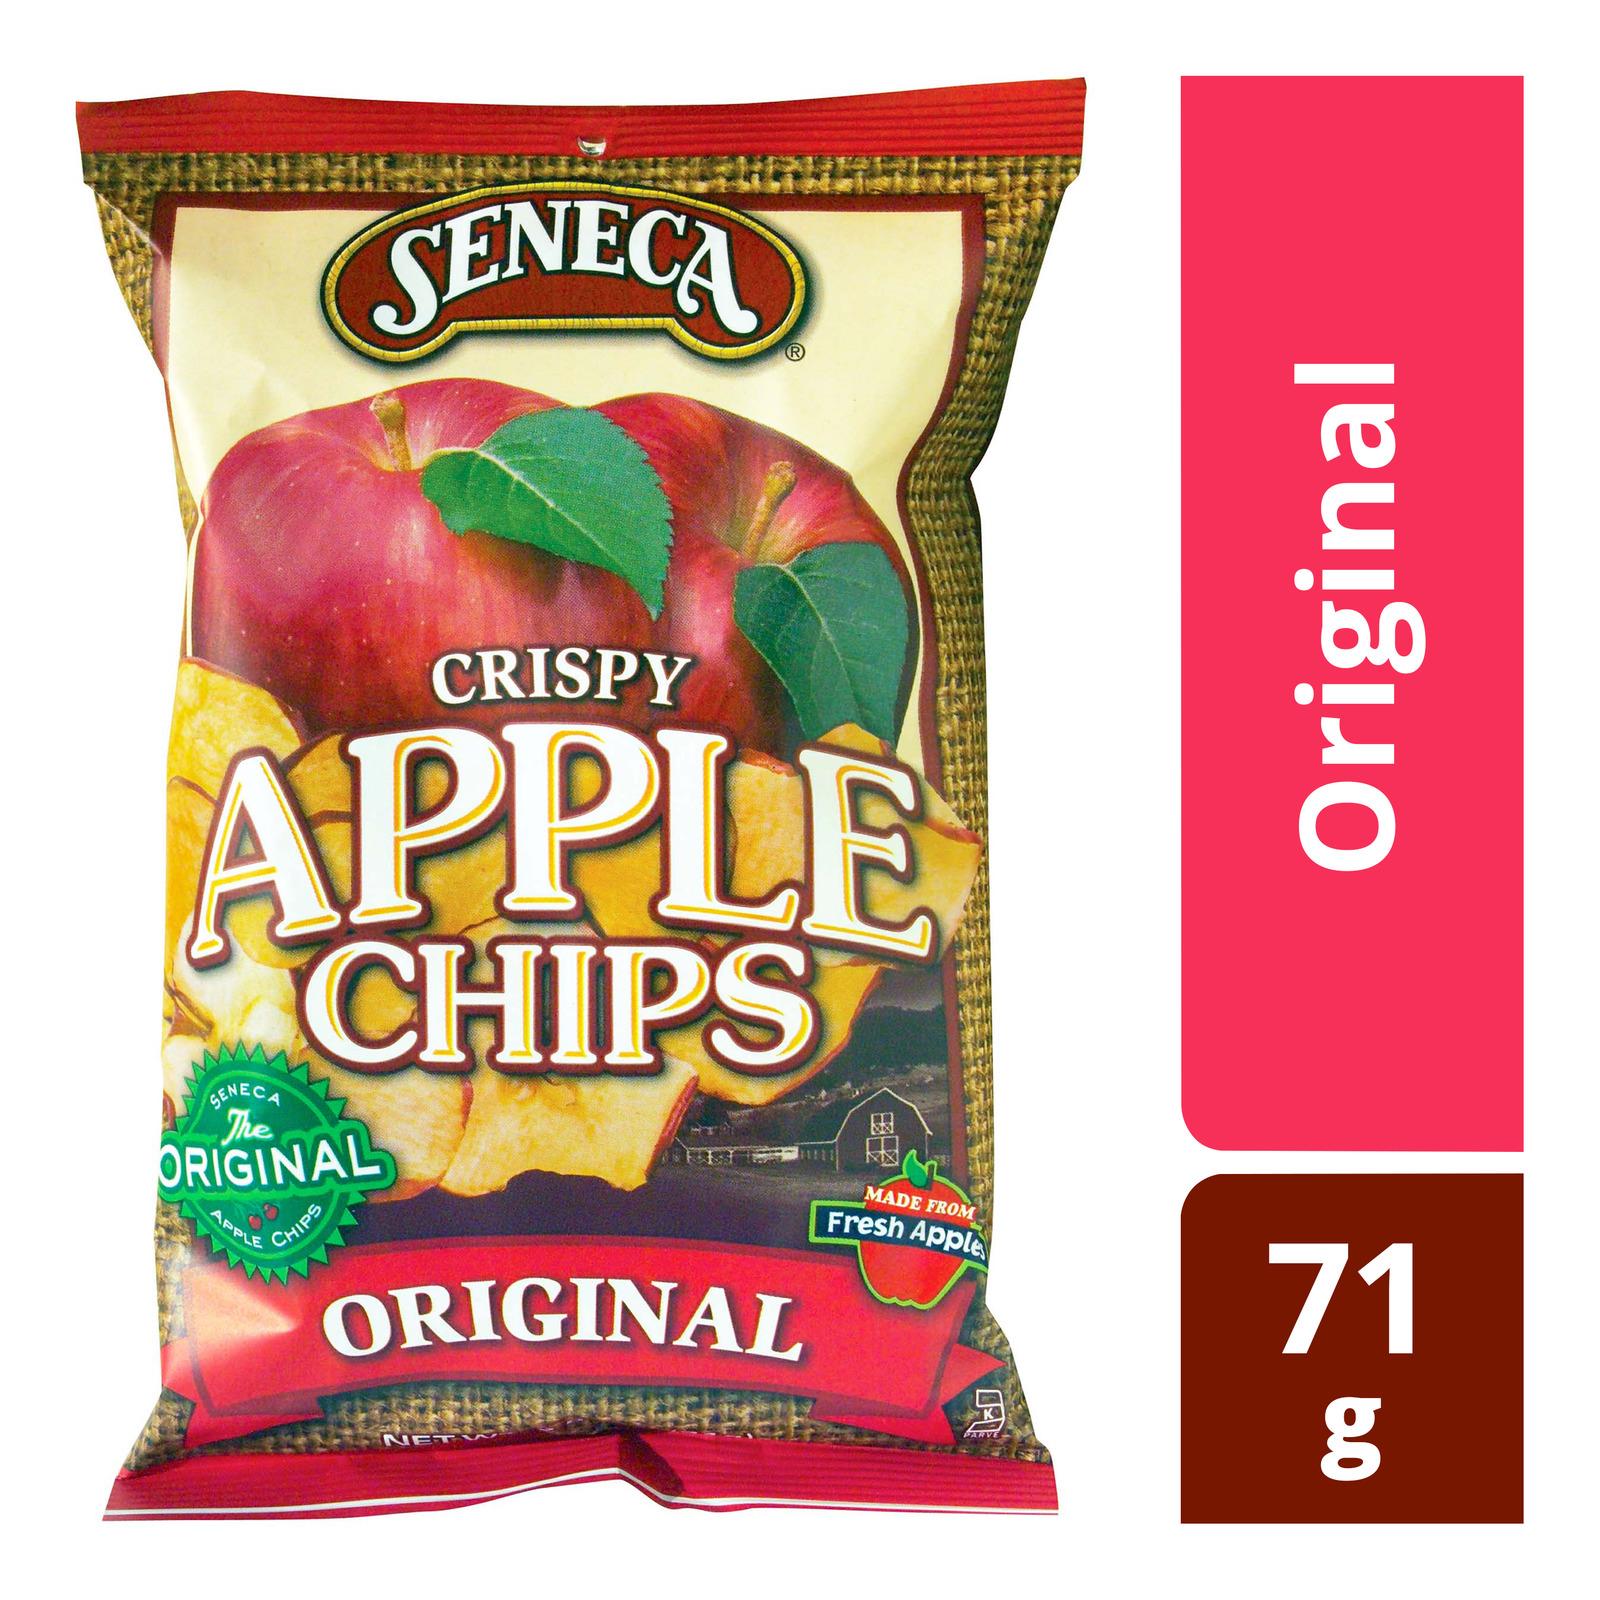 Seneca Crispy Apple Chips - Original